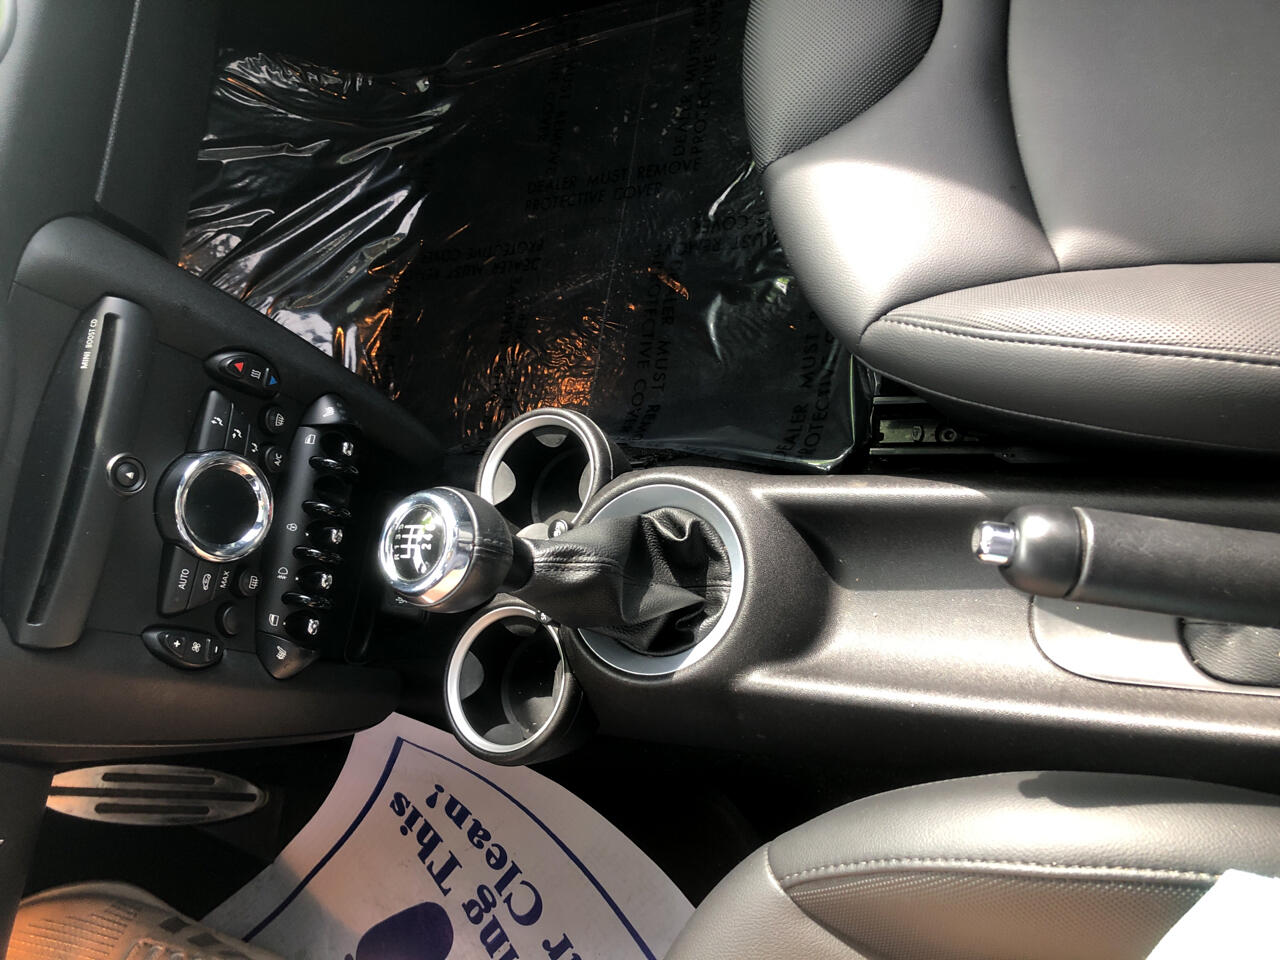 2013 MINI Cooper Hardtop 2dr Cpe S